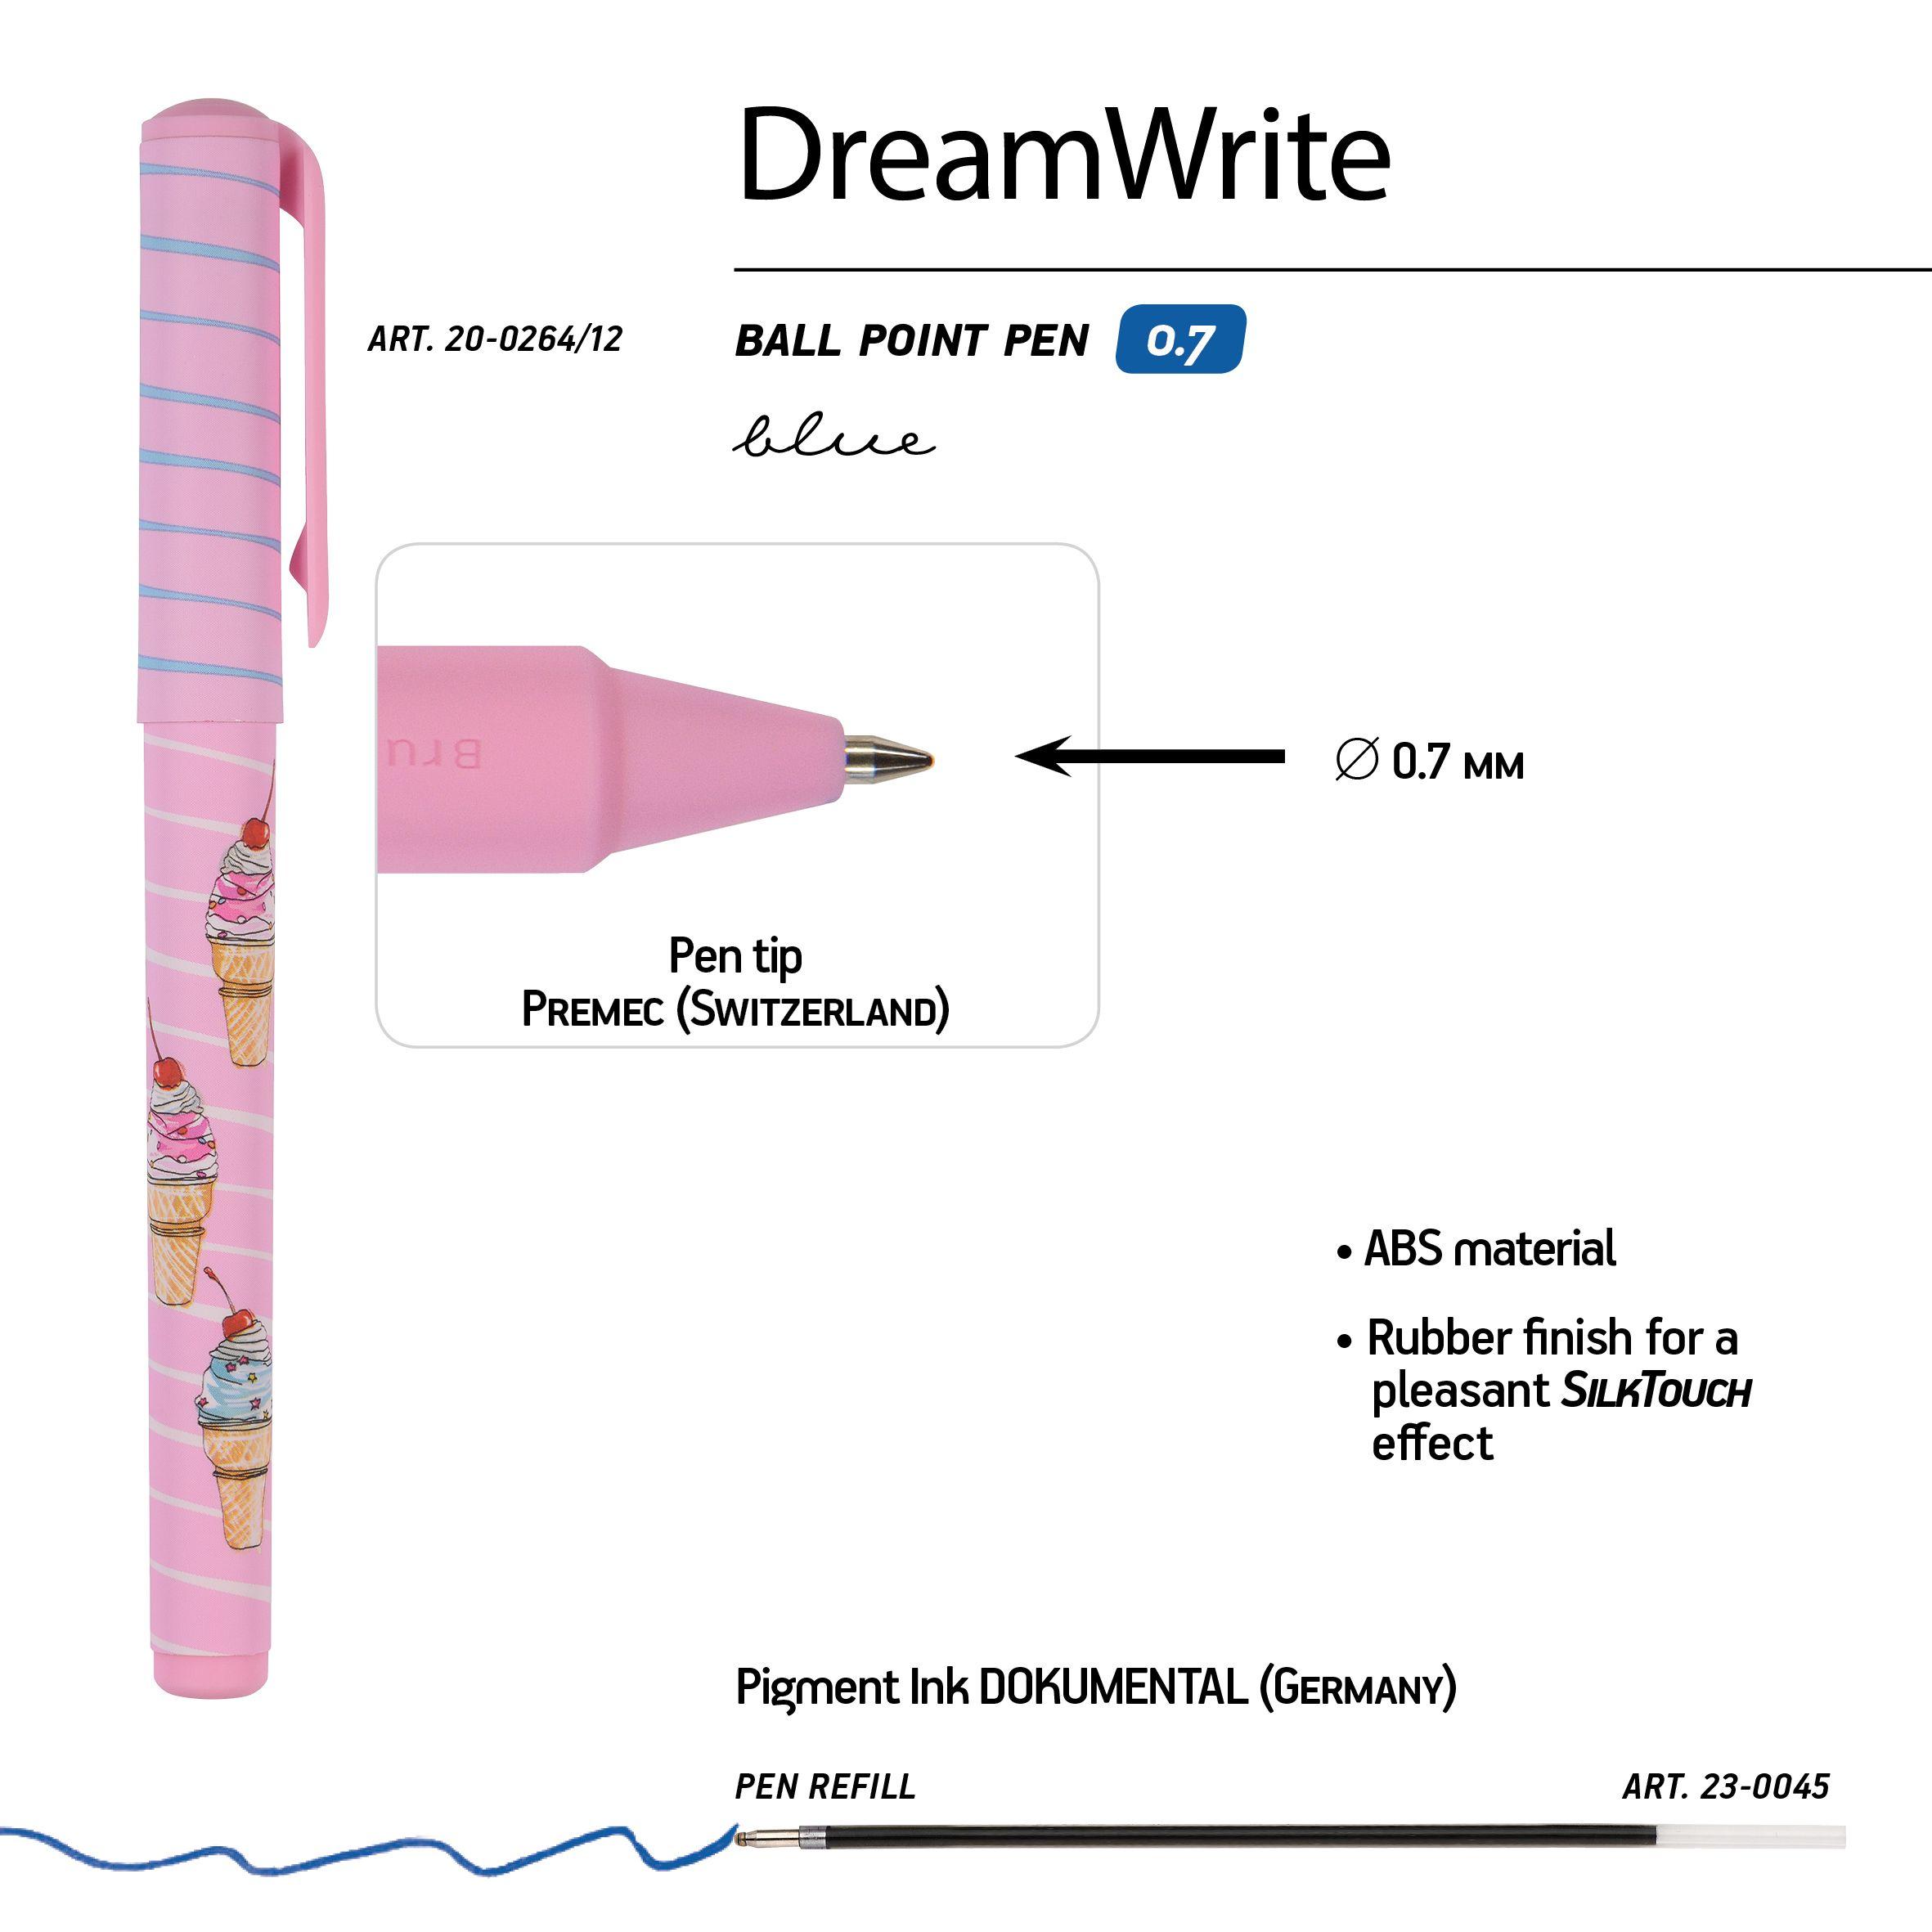 Ручка подар шар BV DreamWrite синяя 0,7мм Сахарный рожок